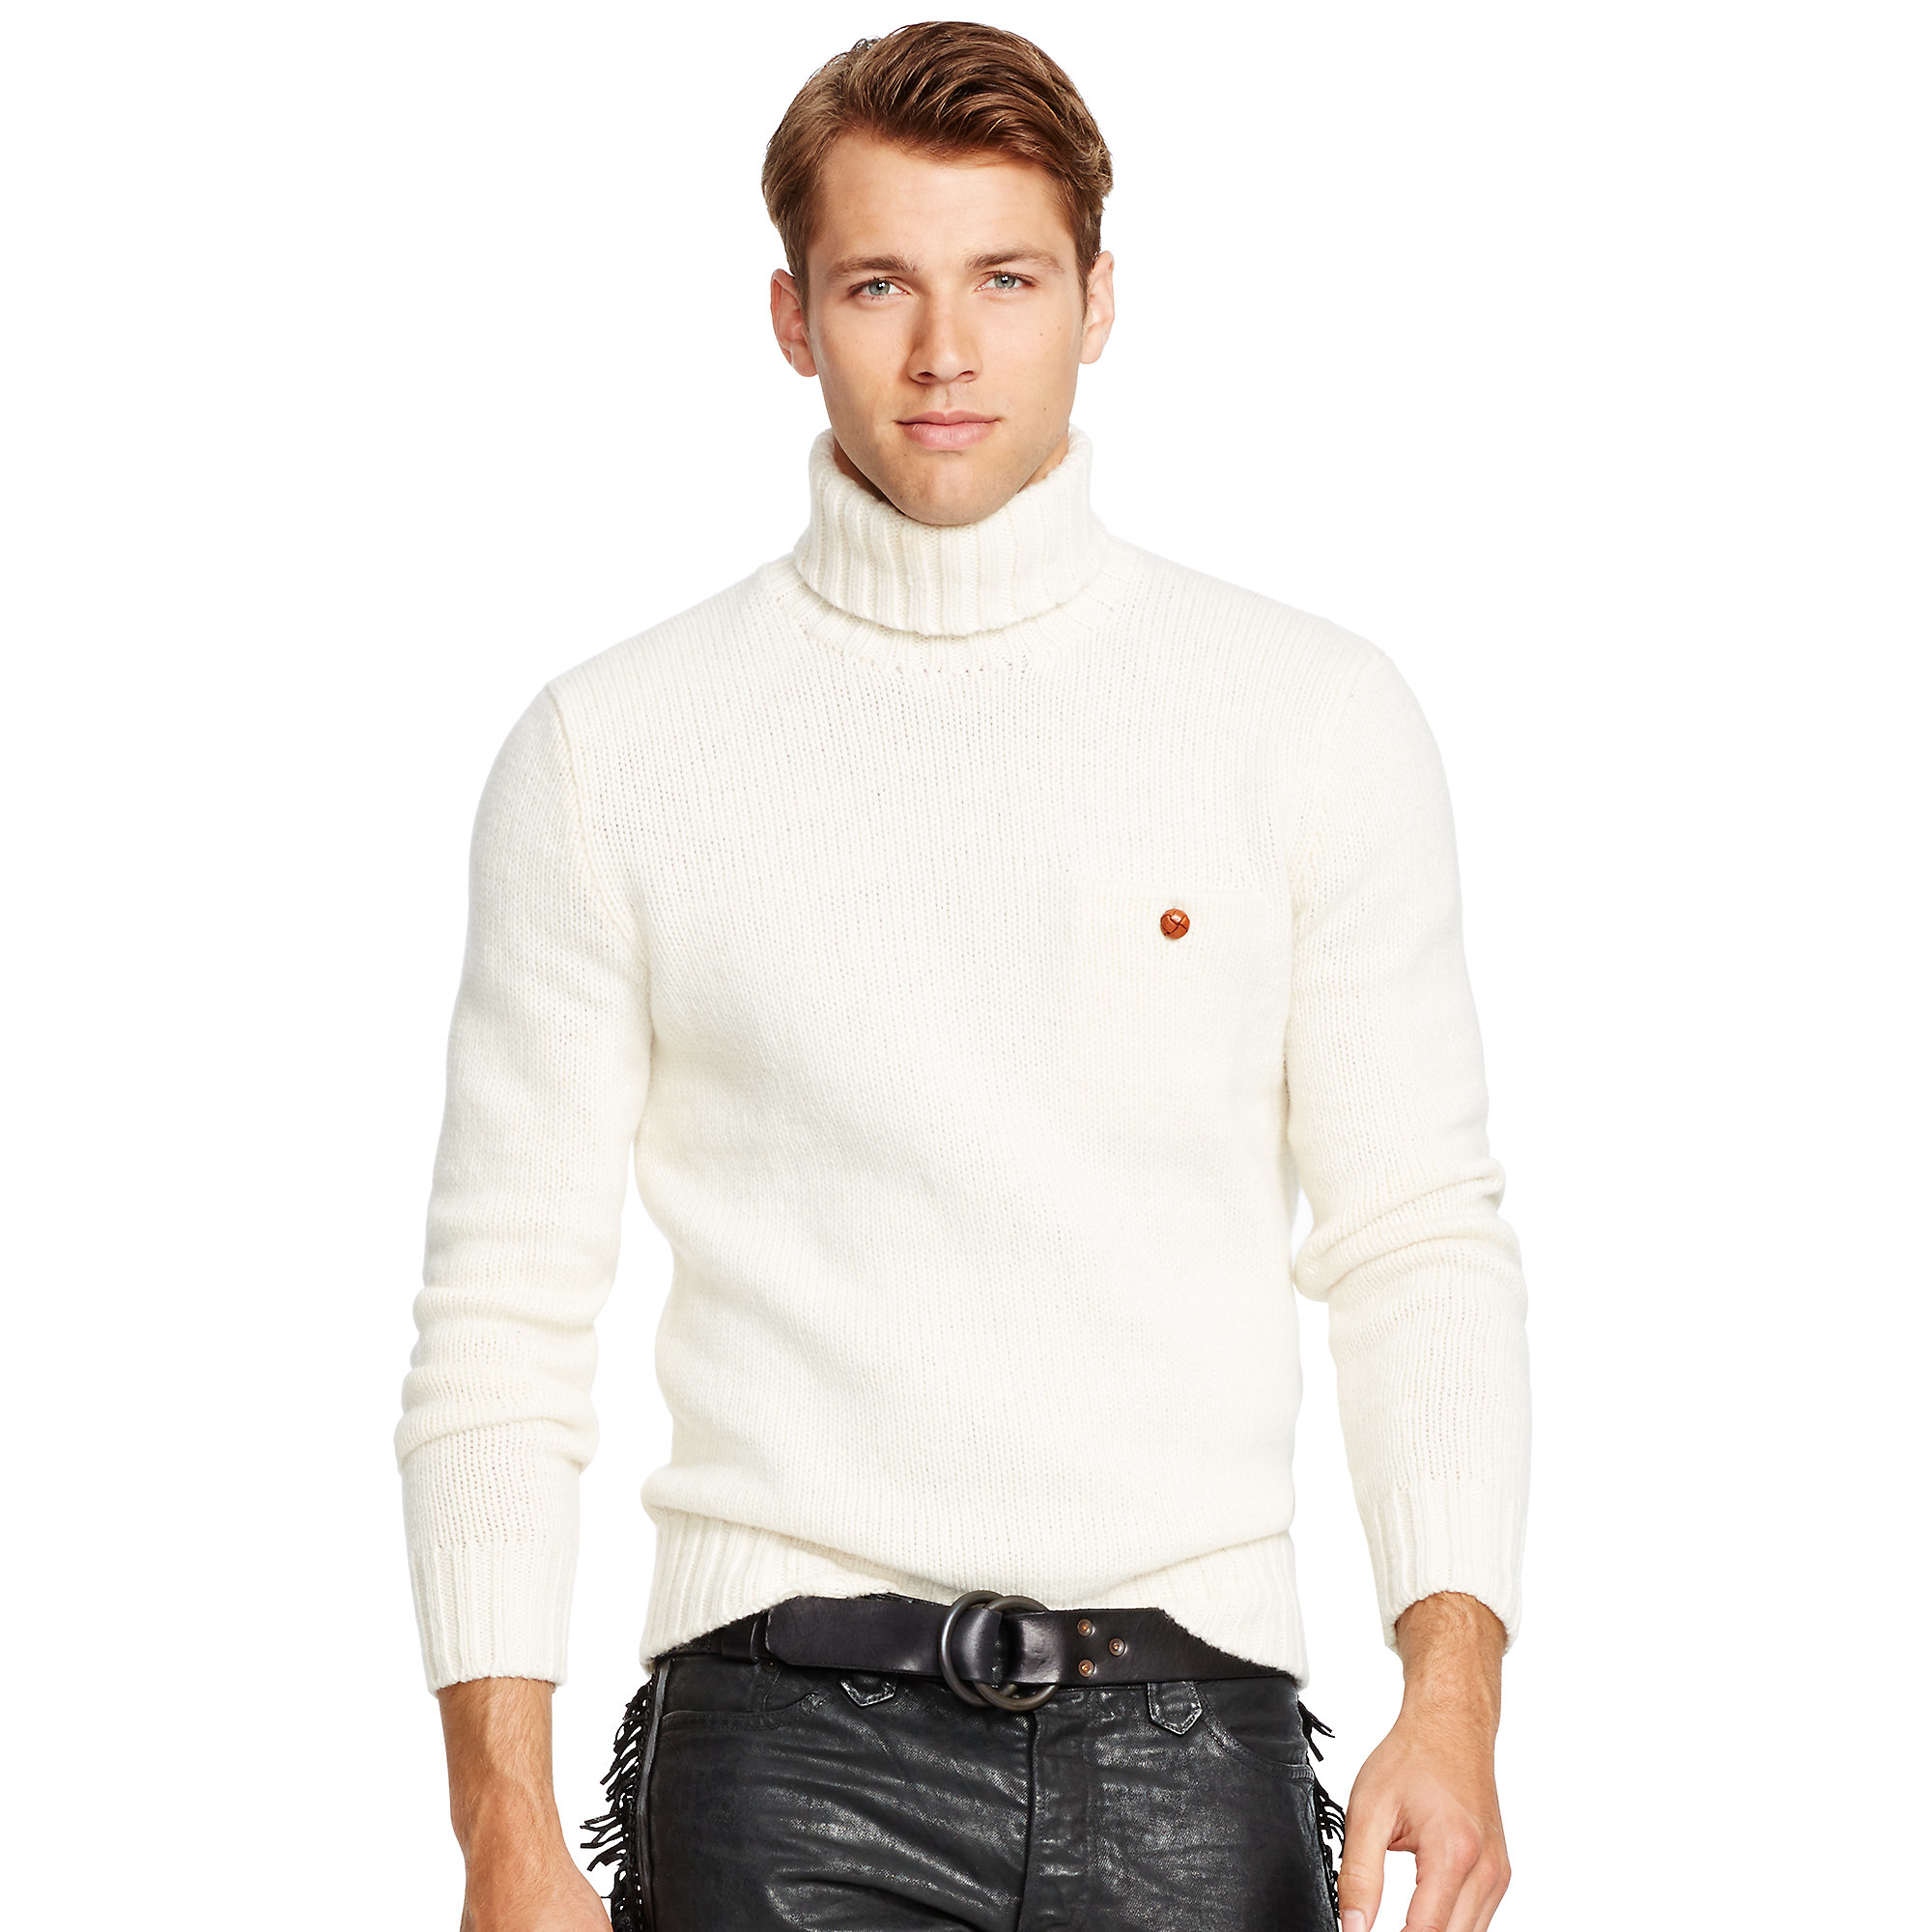 Lyst Polo Ralph Lauren Merino Wool Turtleneck Sweater In Natural